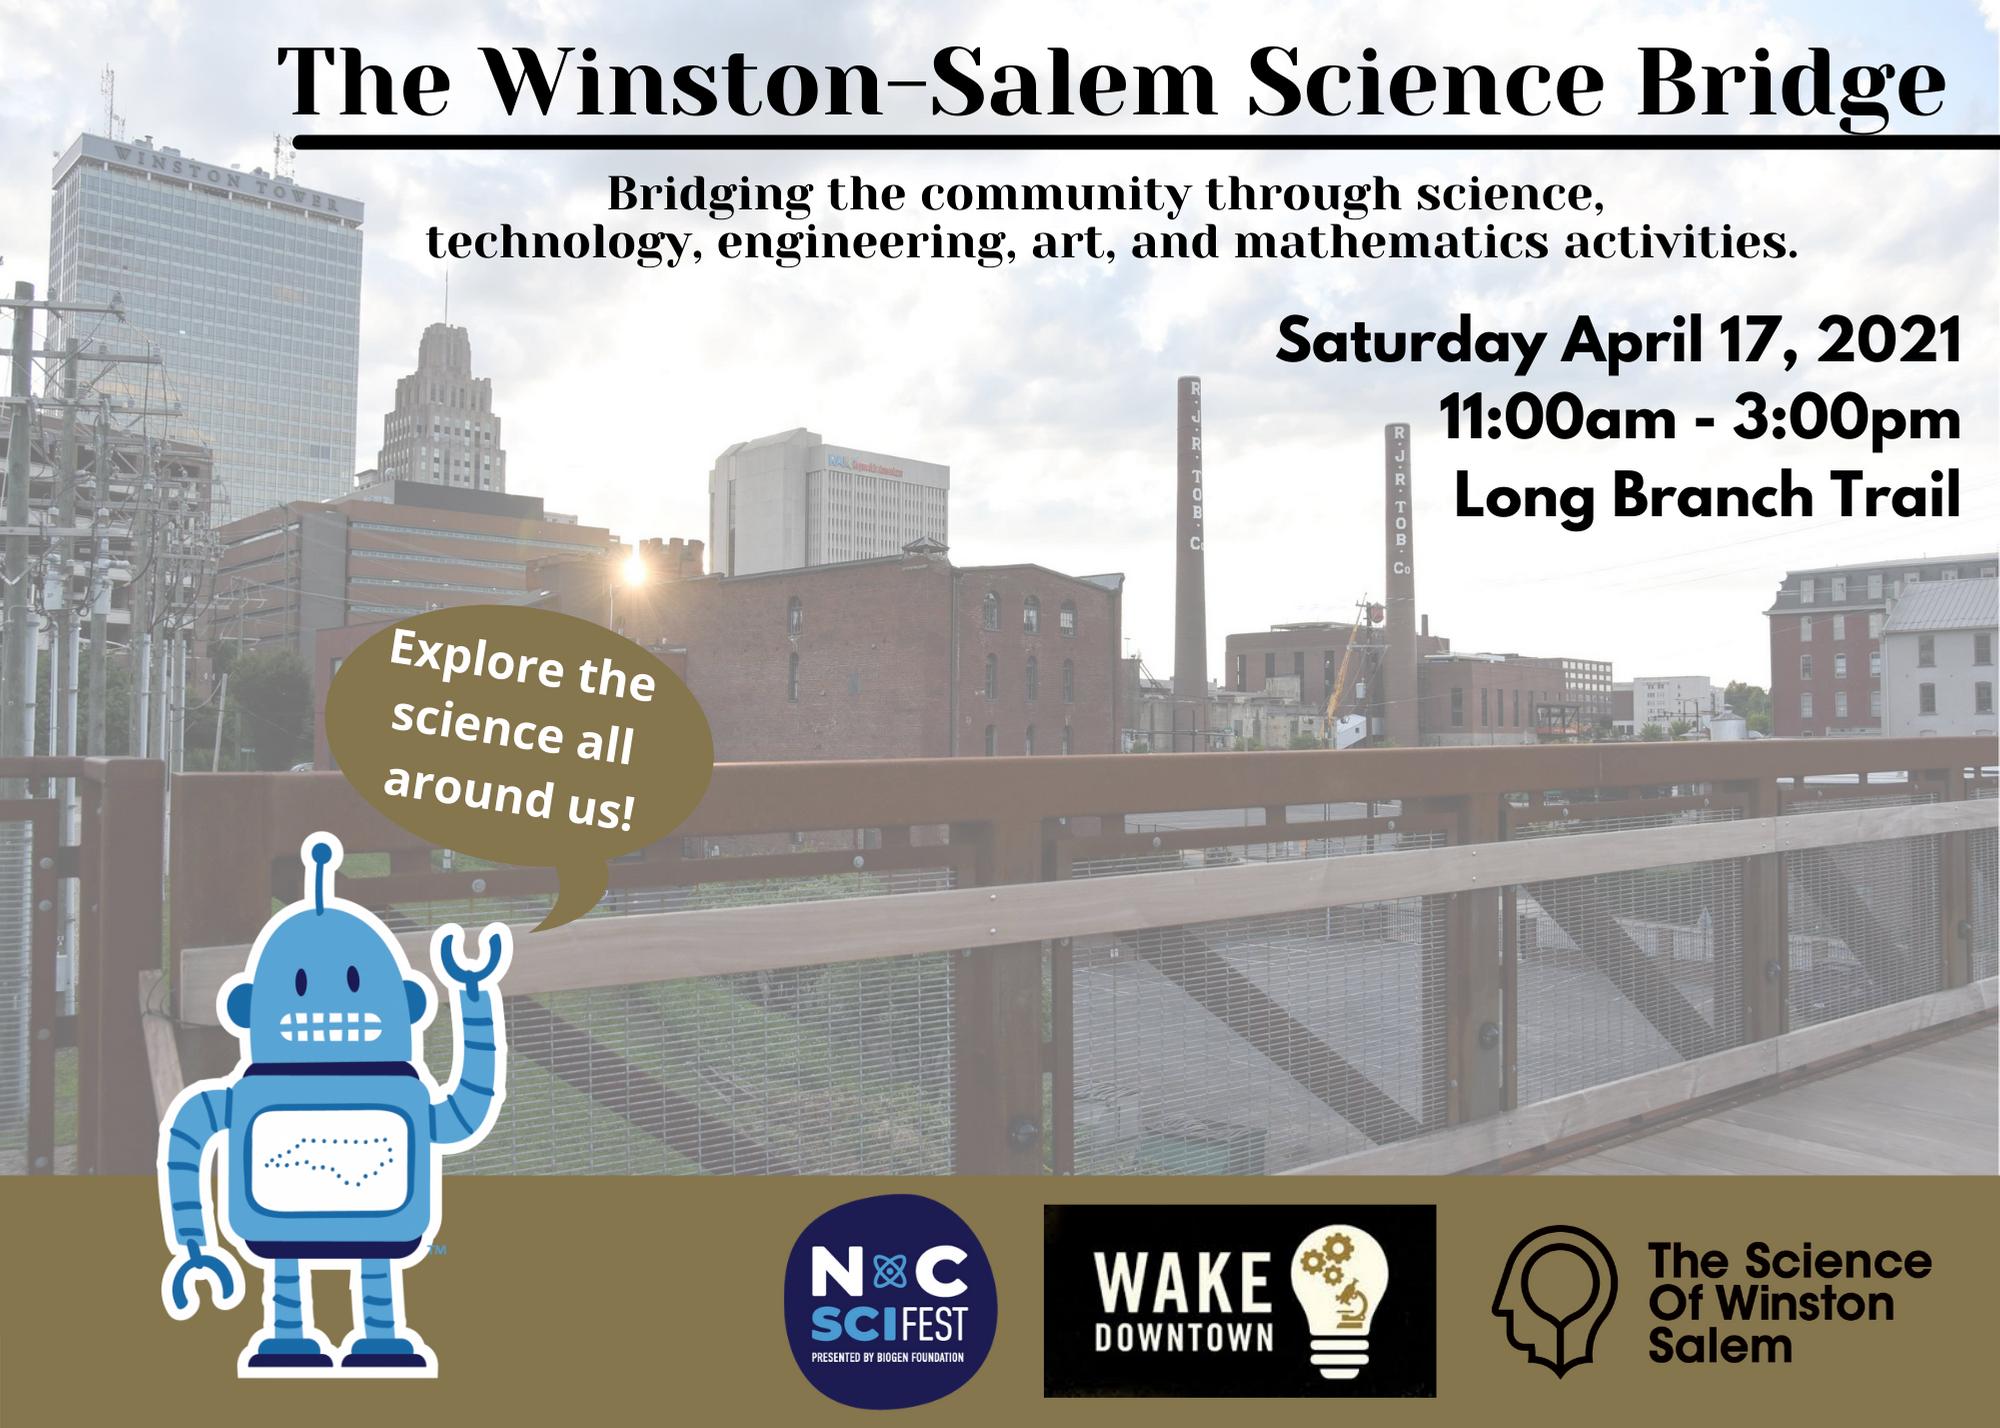 The Winston-Salem Science Bridge Flyer